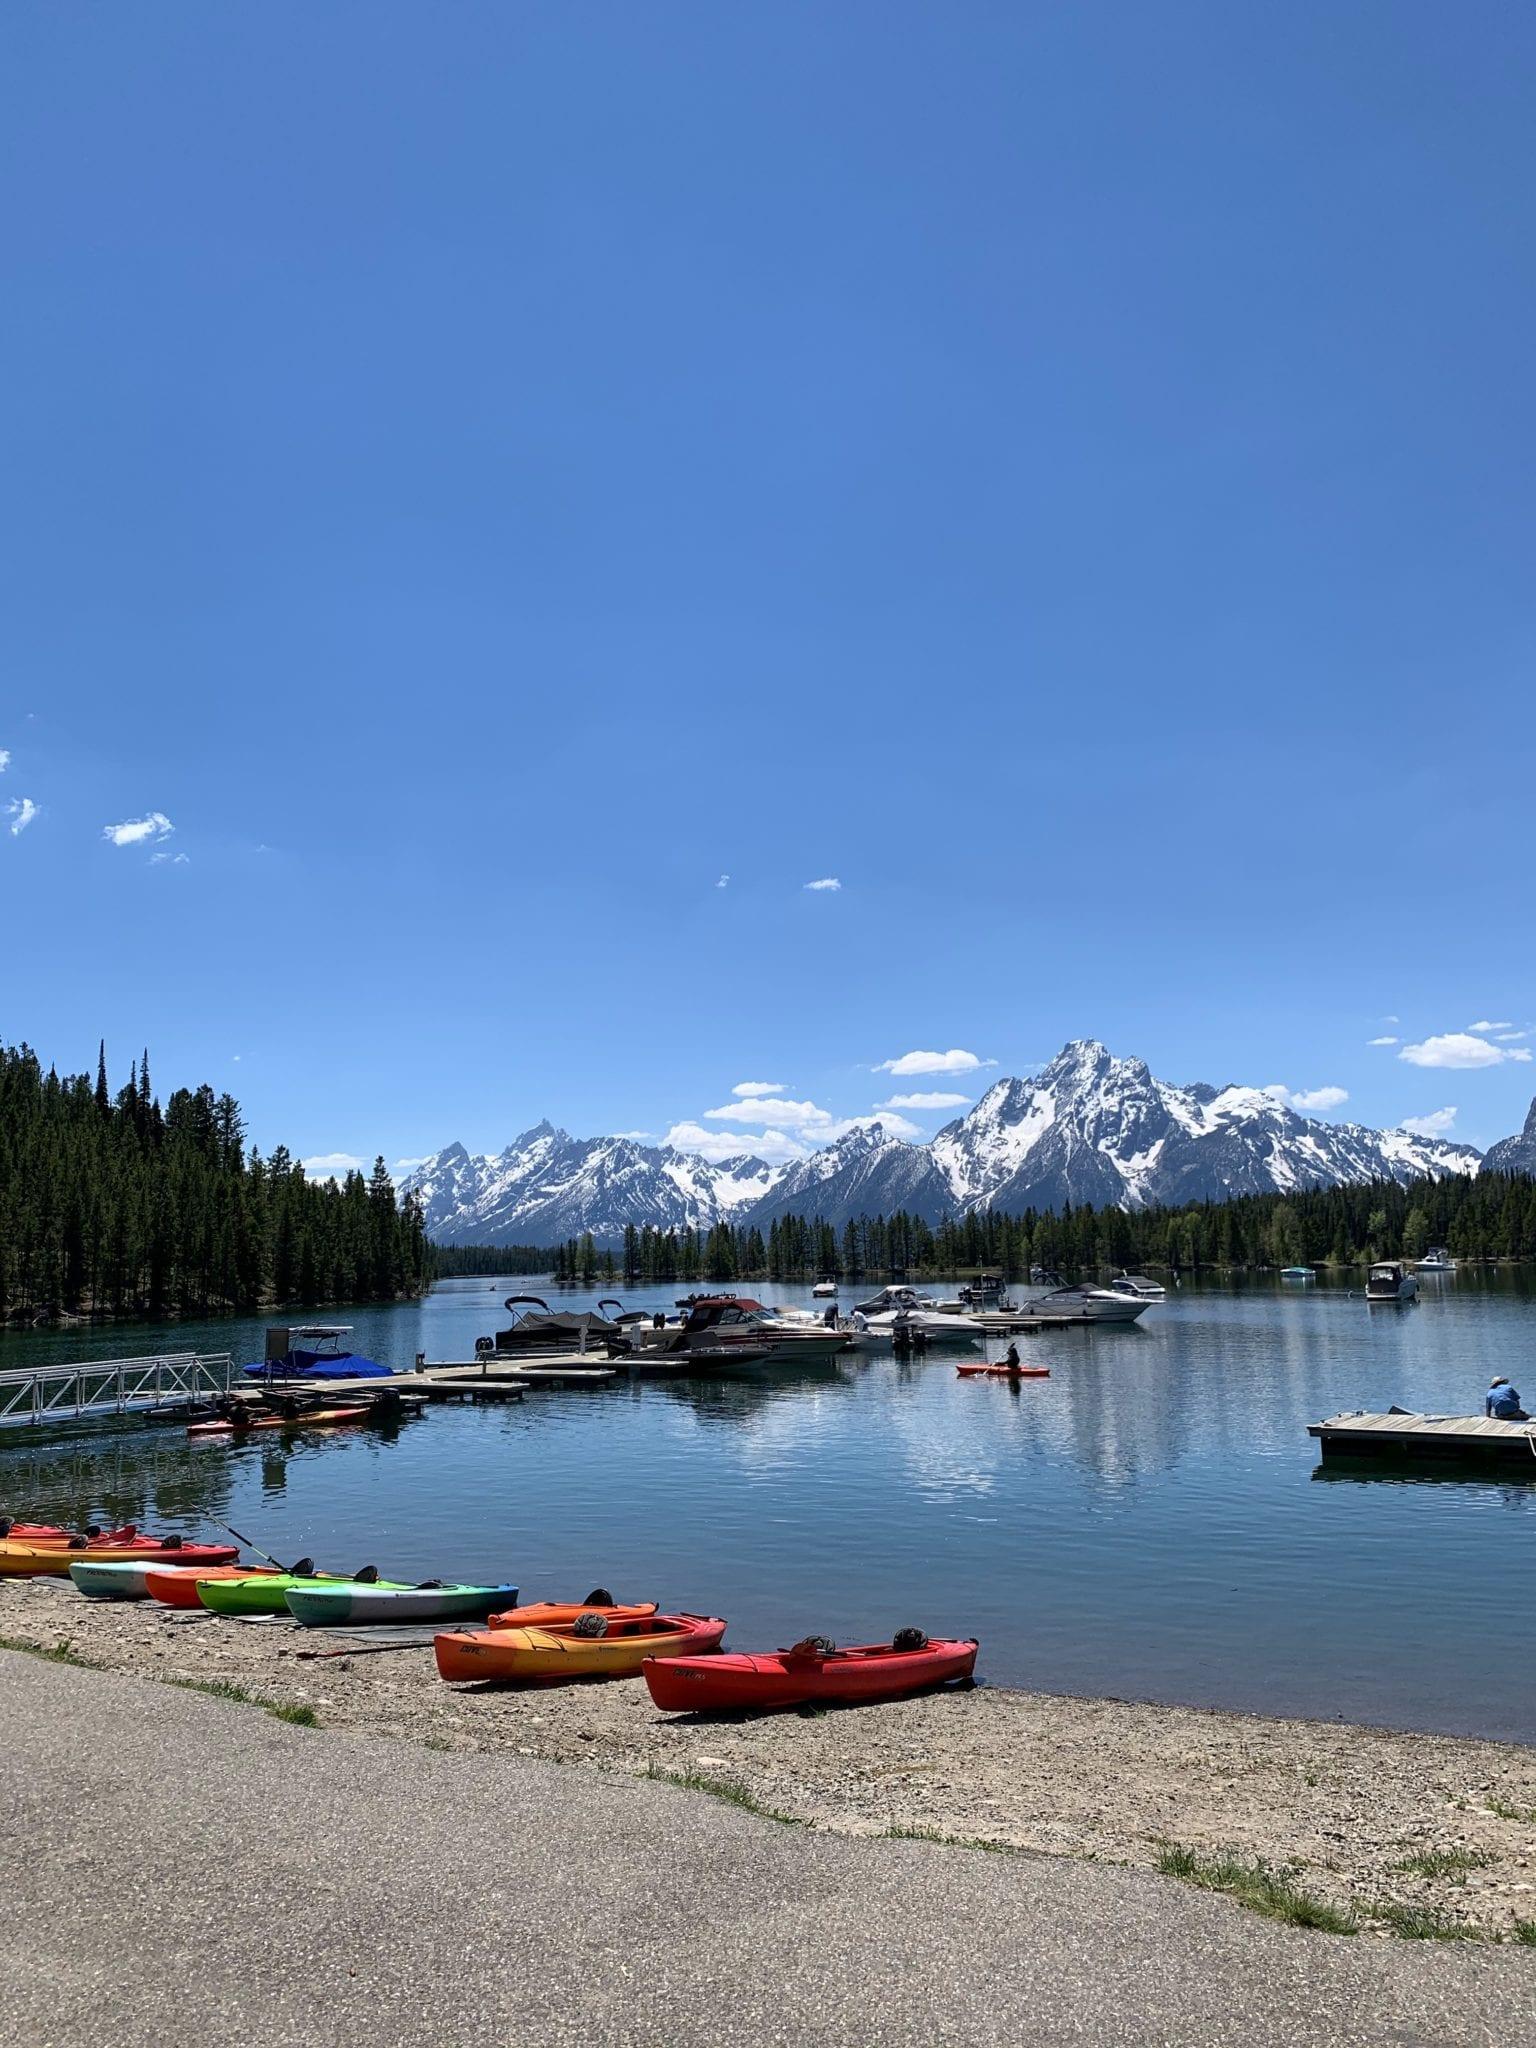 Jackson Lake Marina in Grand Tetons National Park